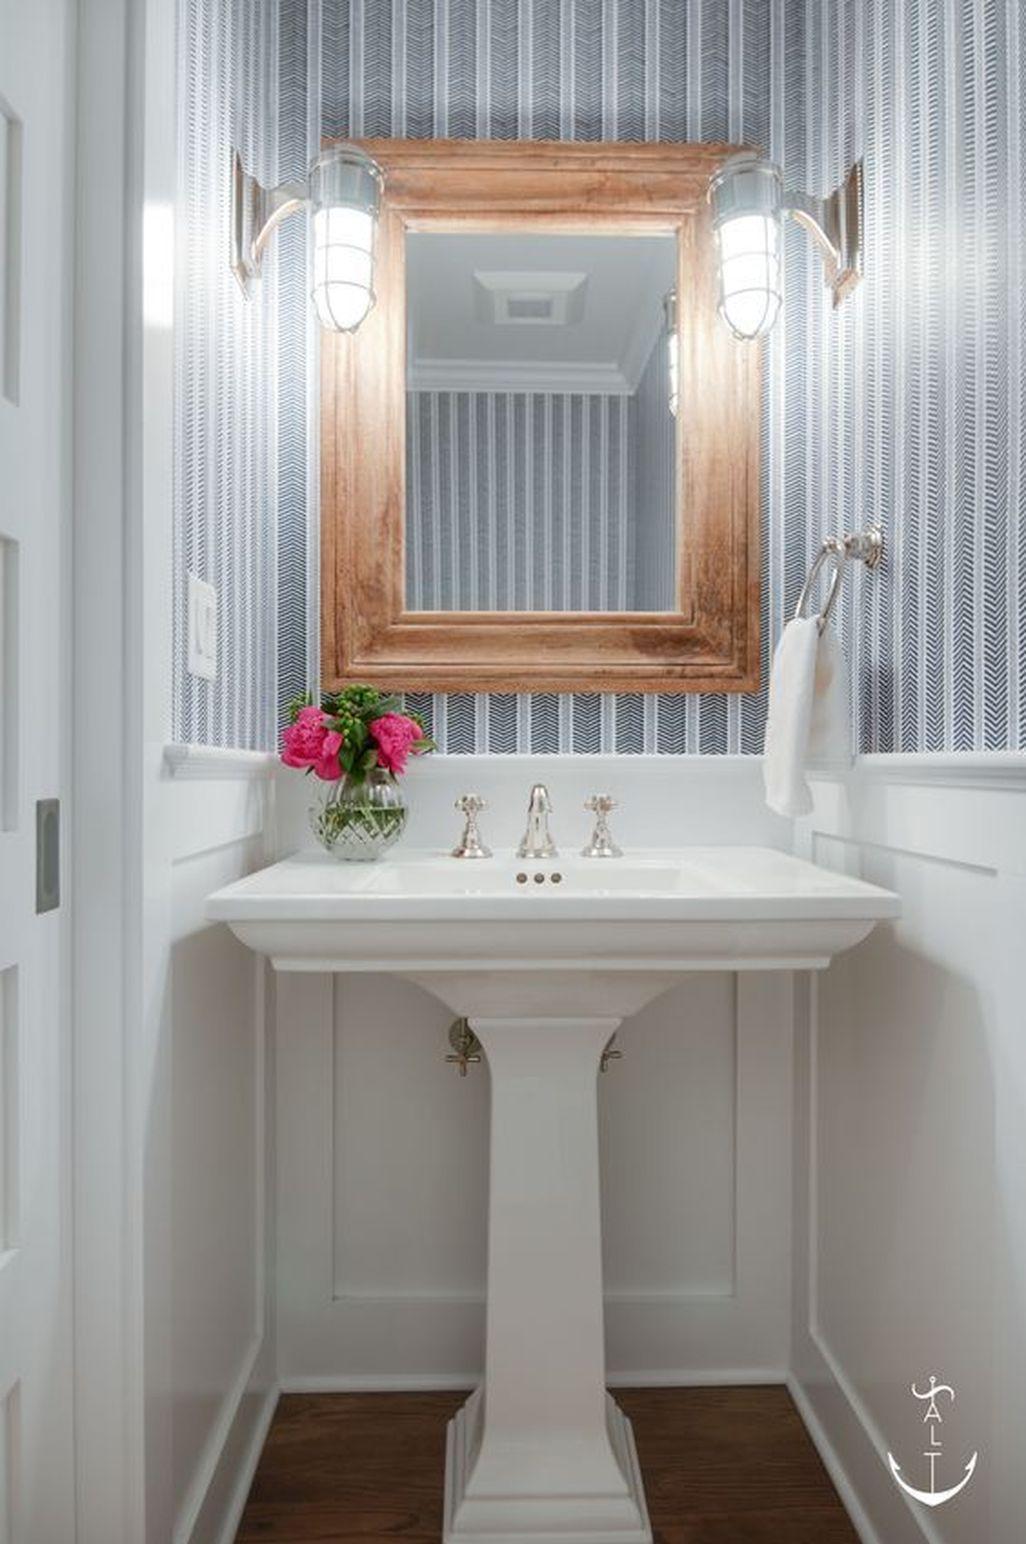 Pin By Pratamadan Ramadhan On Bathroom Decoration Simple Powder Room Small Bathroom Remodel Cost Bathroom Remodel Shower